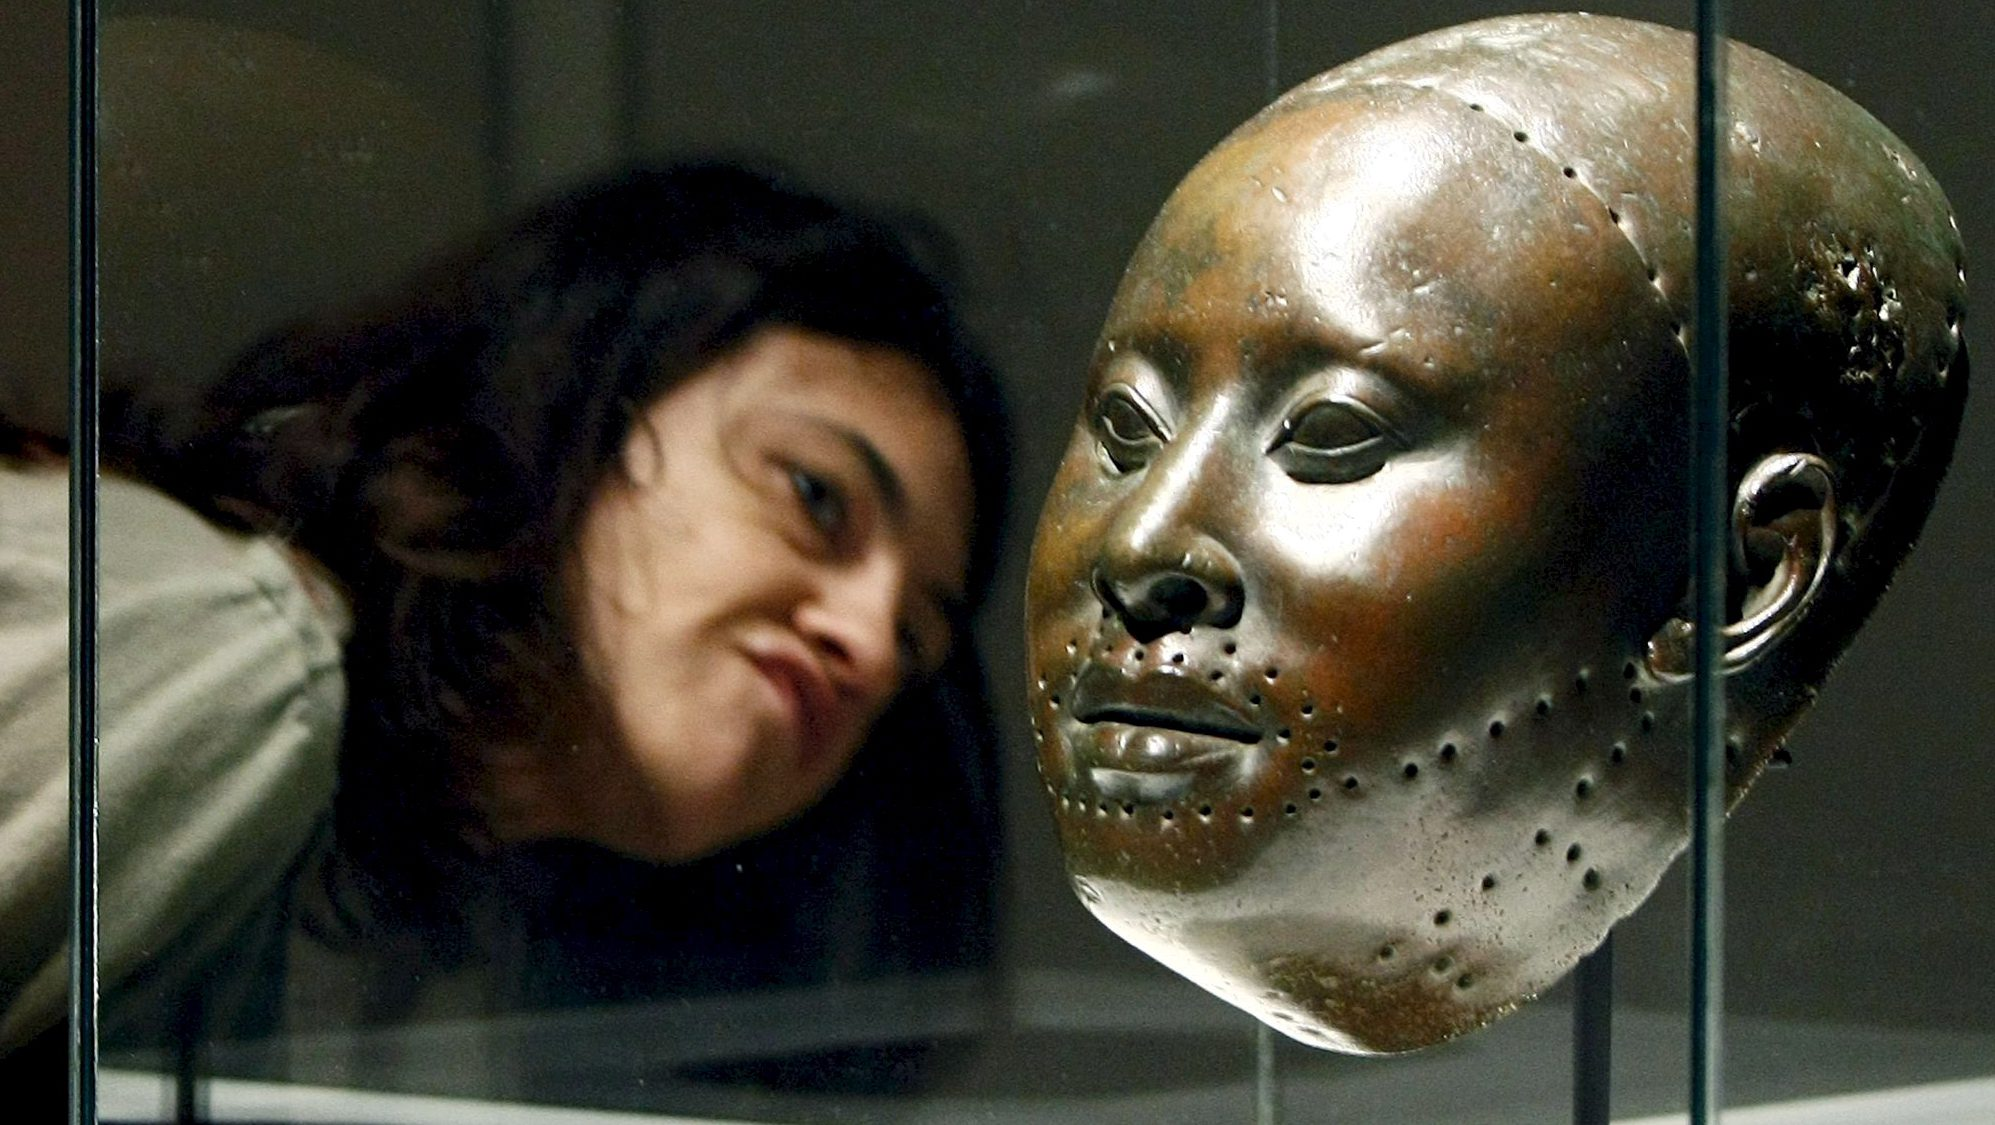 Nigeria Art exhitibition opens in Santander